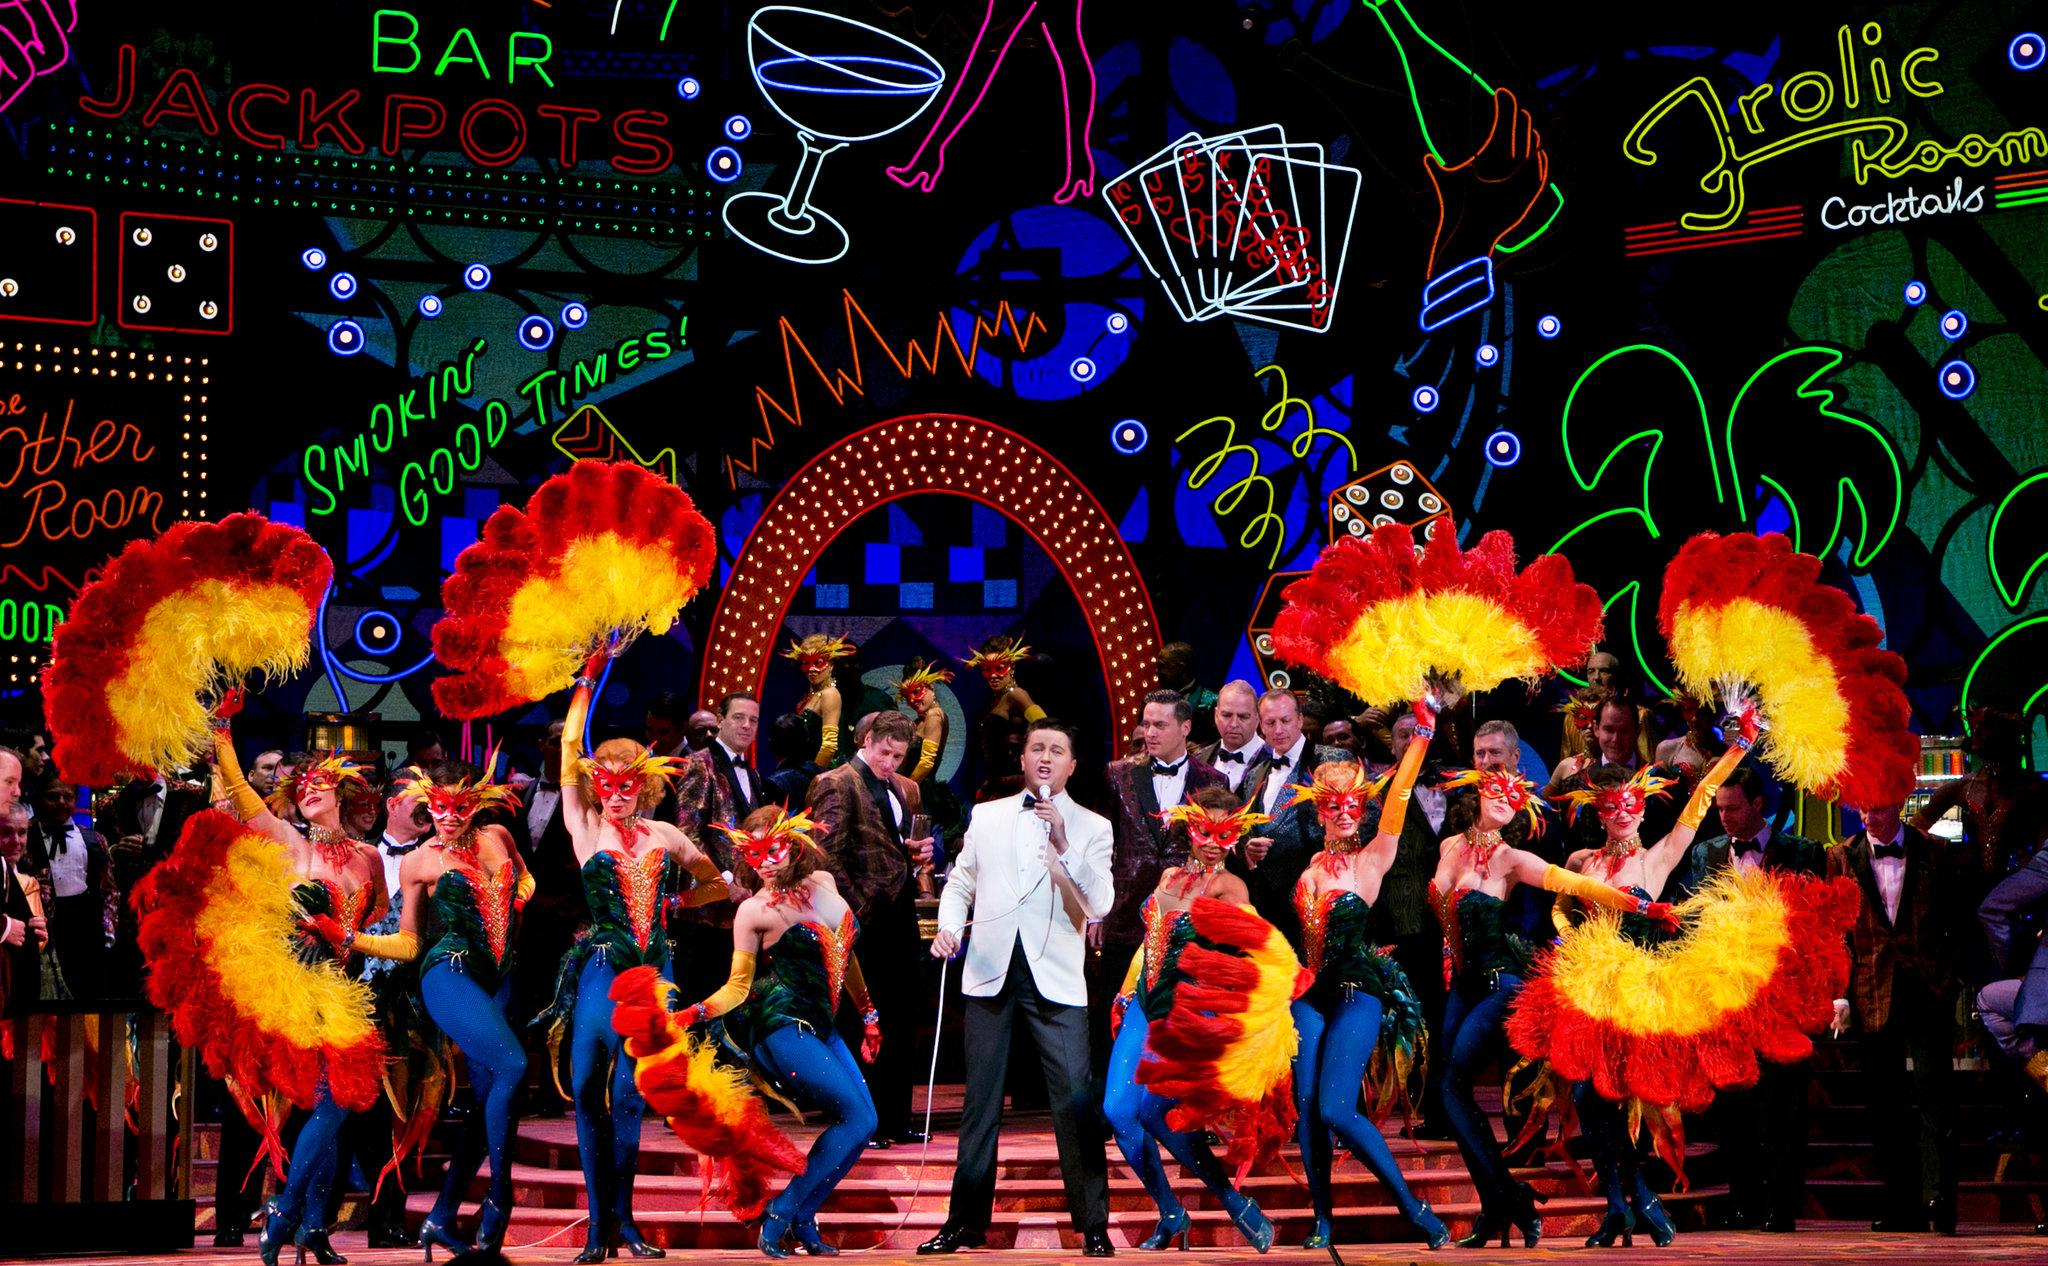 Tuxedo Wallpaper Hd New Rigoletto At The Metropolitan Opera Nytimes Com